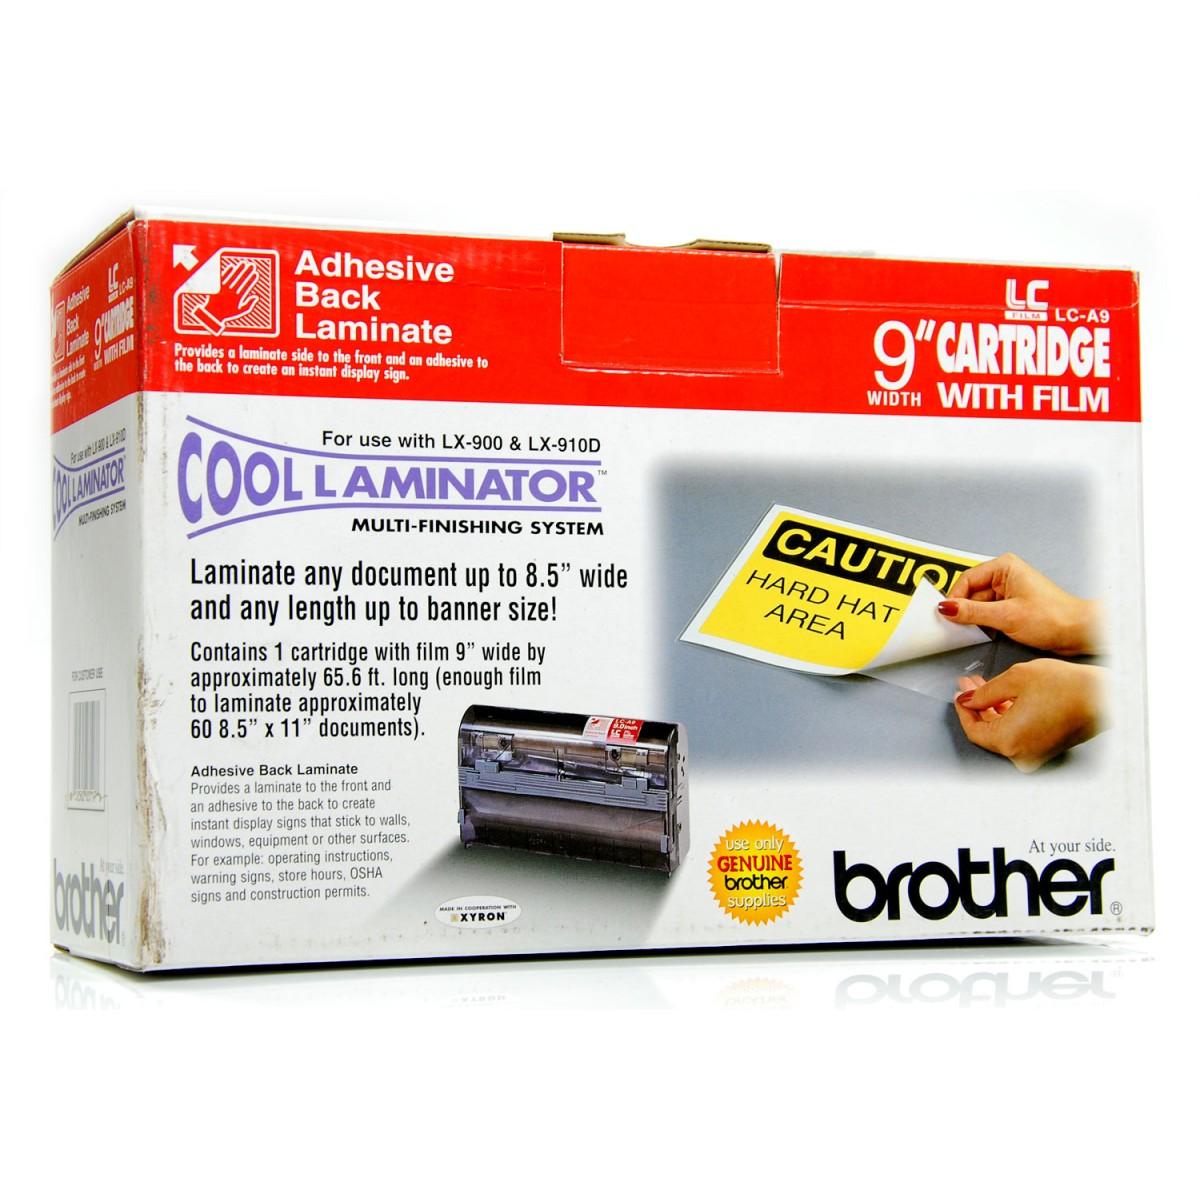 REFIL BROTHER LX-900 & LX-910D - COOL LAMINATOR LC-A9 Adesive - Box